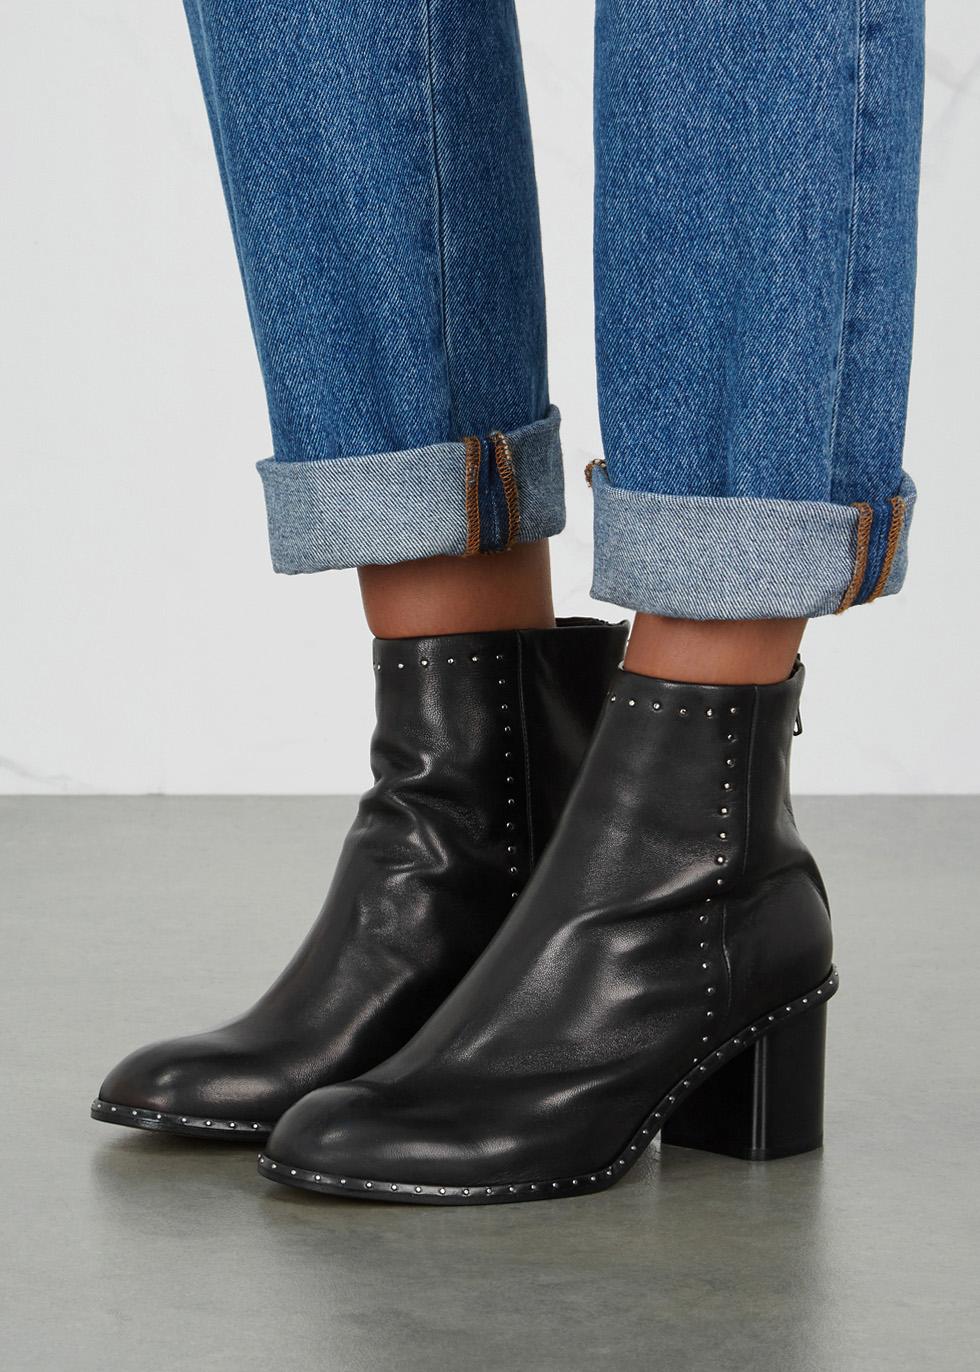 16289a9da6c rag   bone Willow 50 studded leather ankle boots - Harvey Nichols